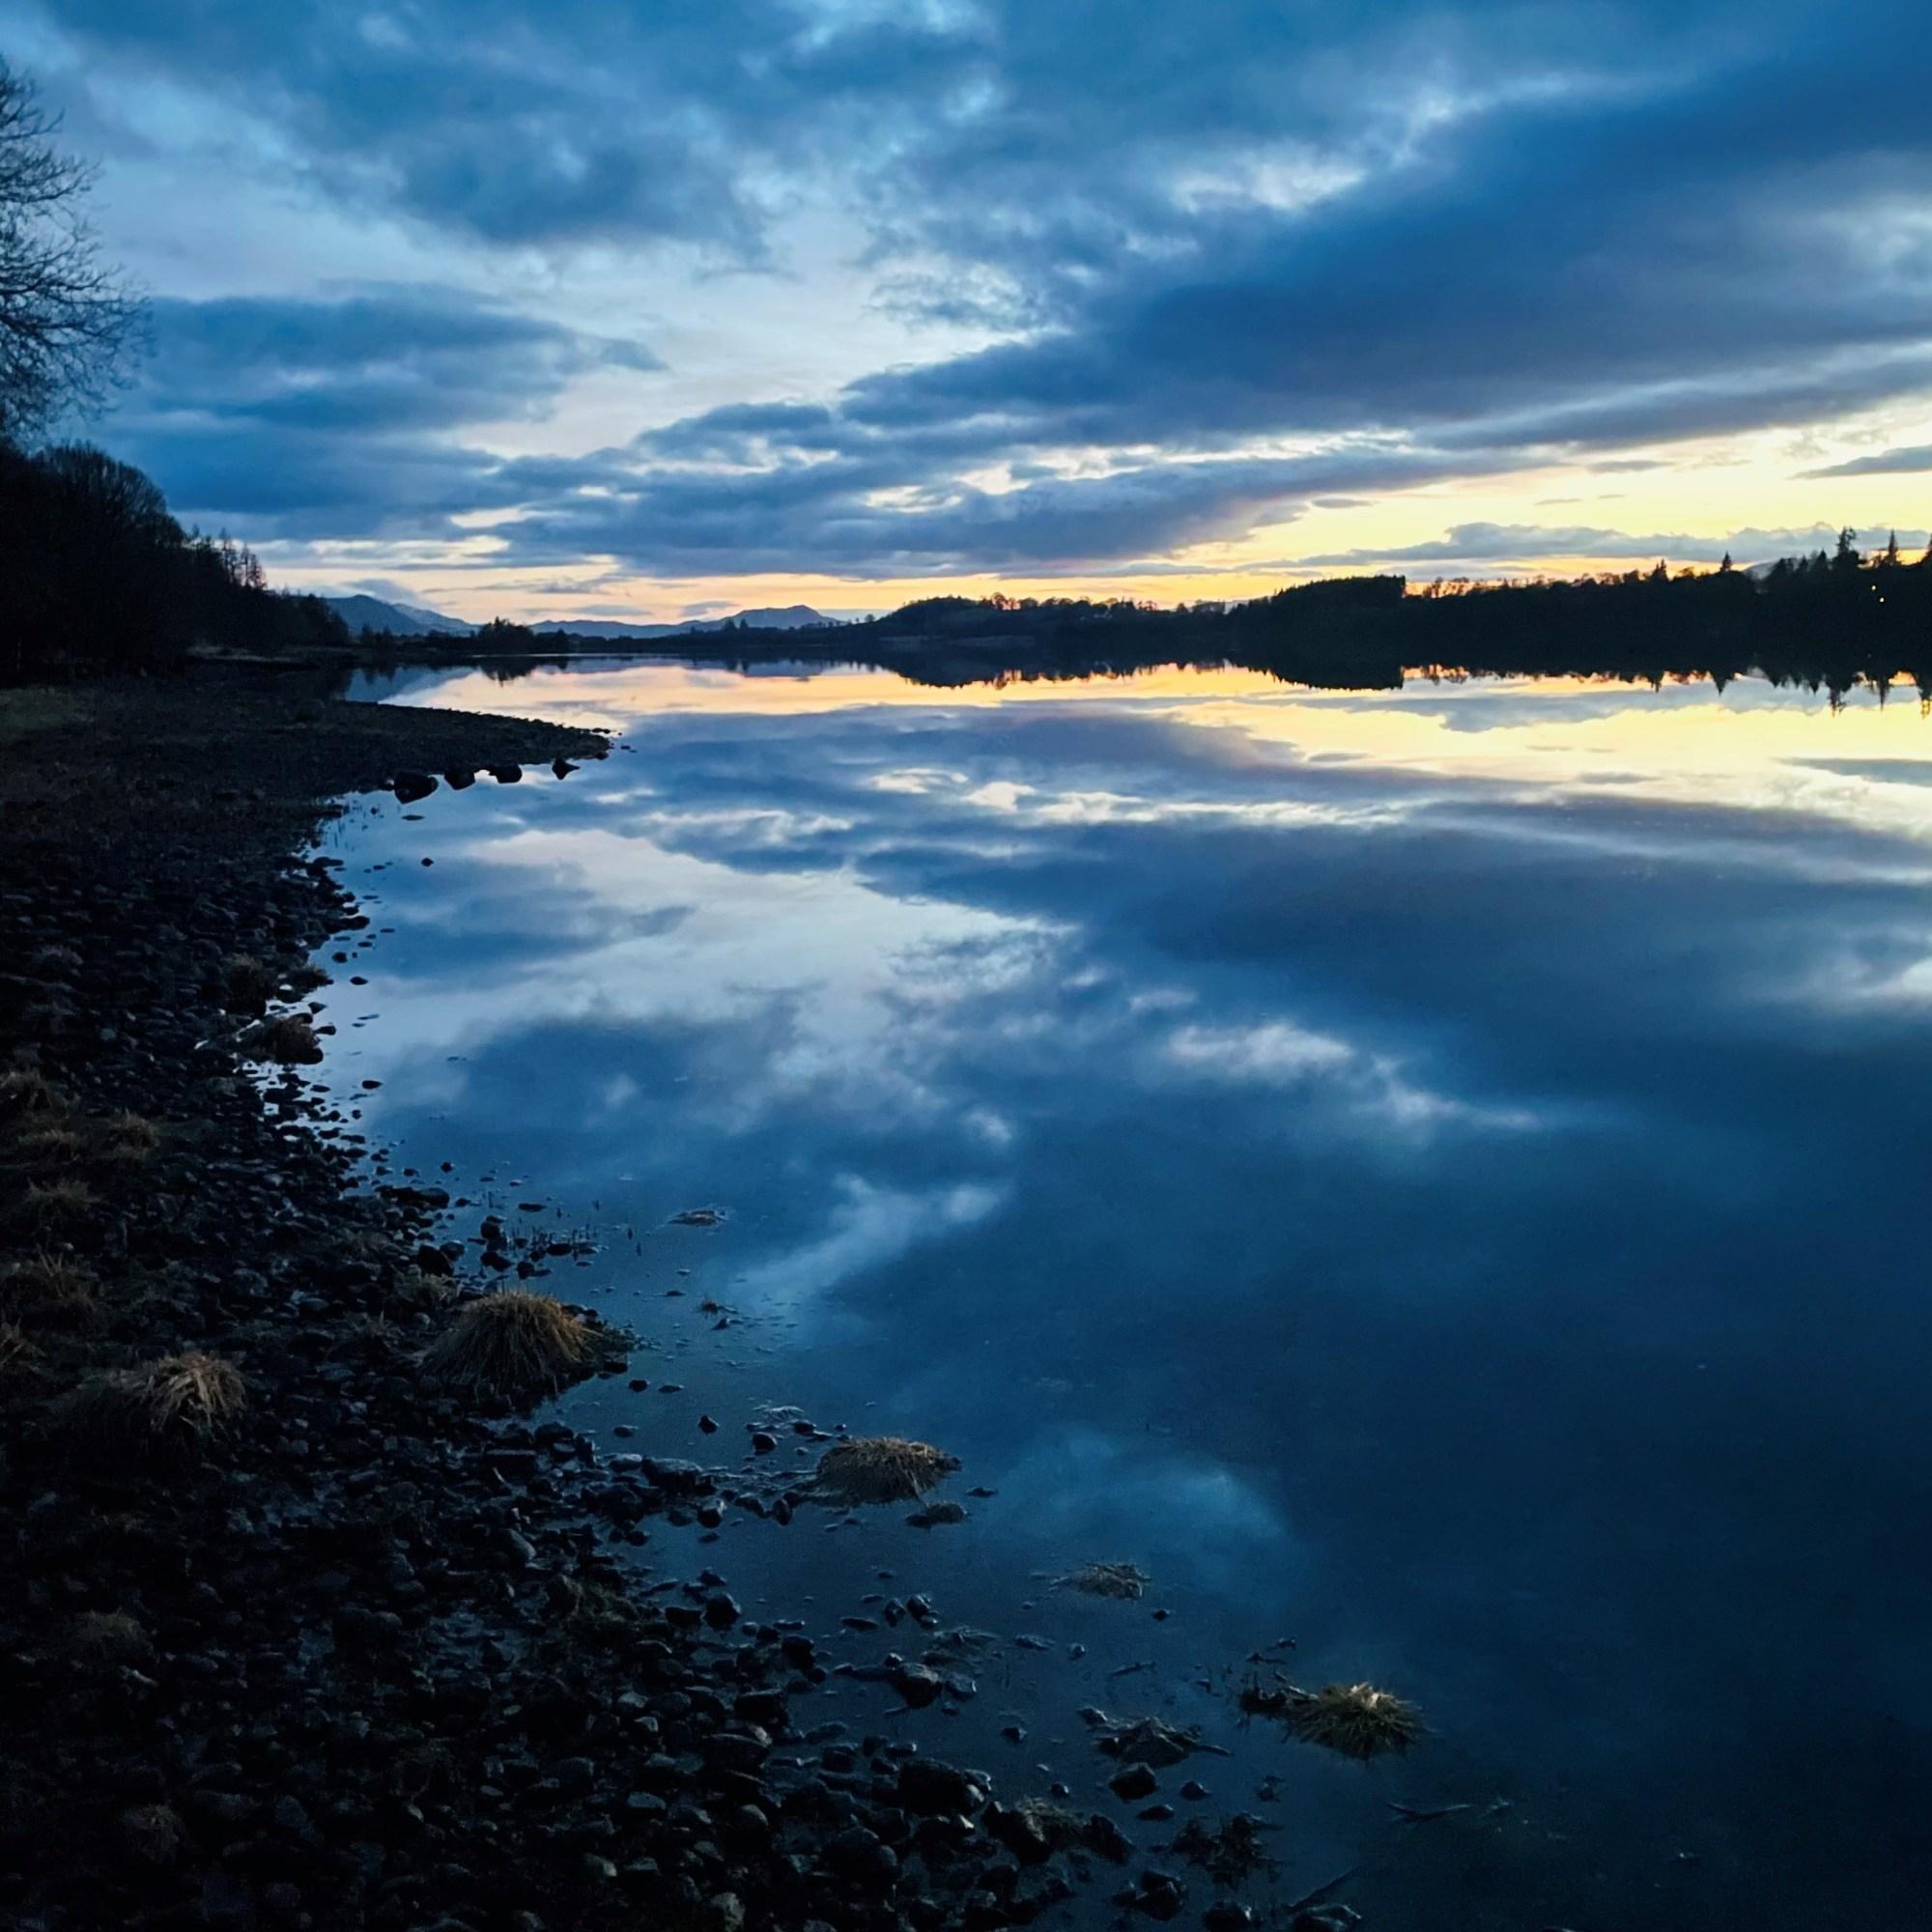 Loch Mhor 7 Loch trail